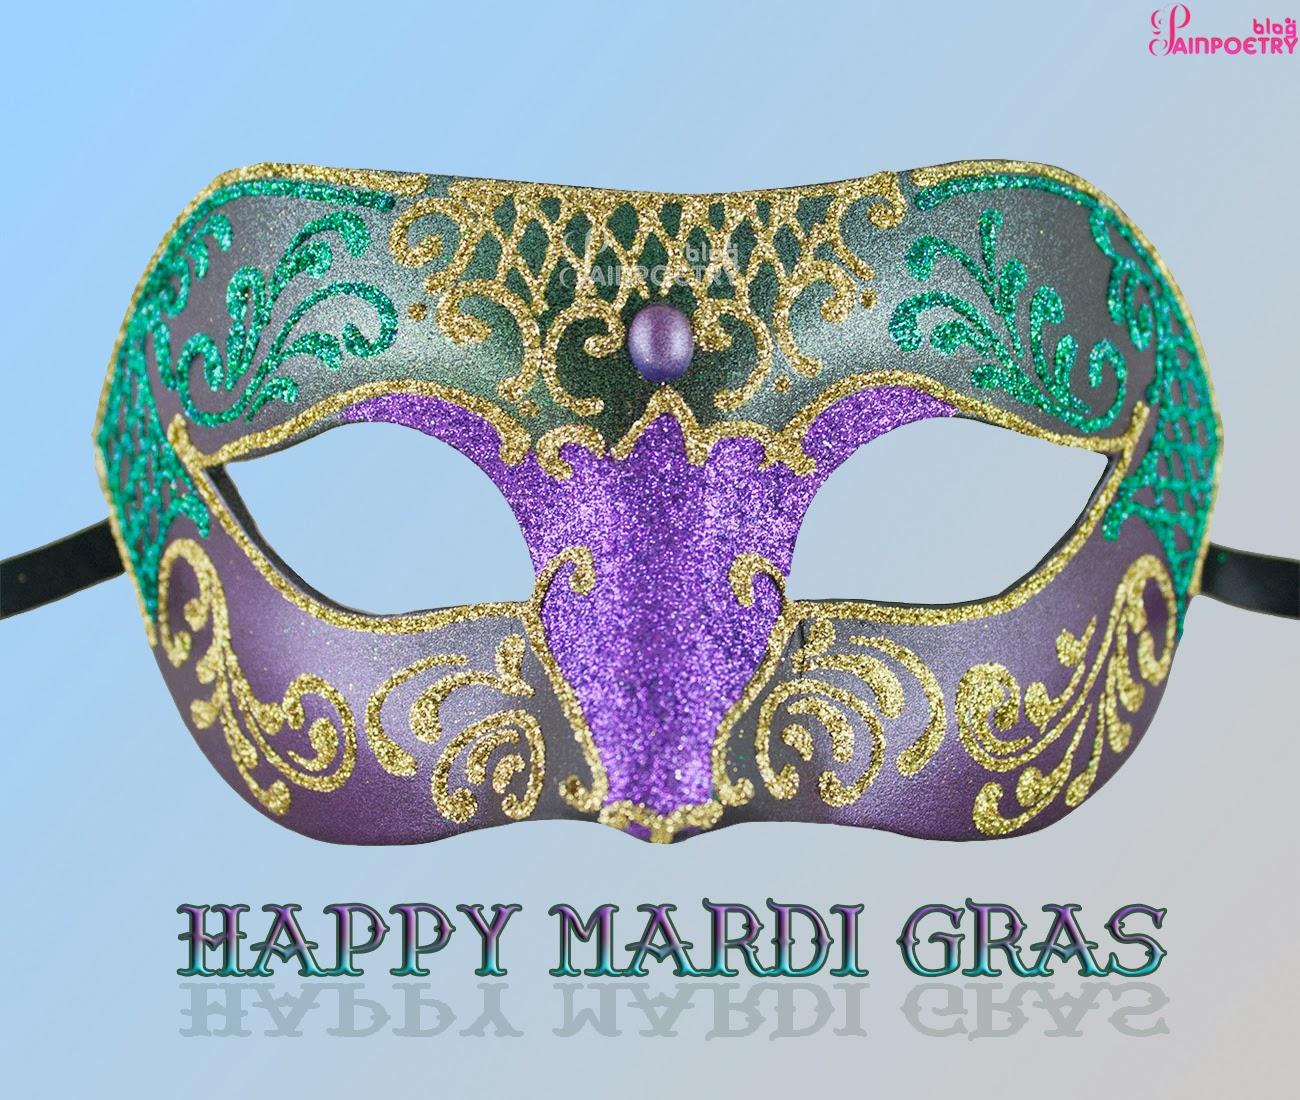 Happy-Mardi-Gras-Mask-Image-Photo-Wallpaper-HD